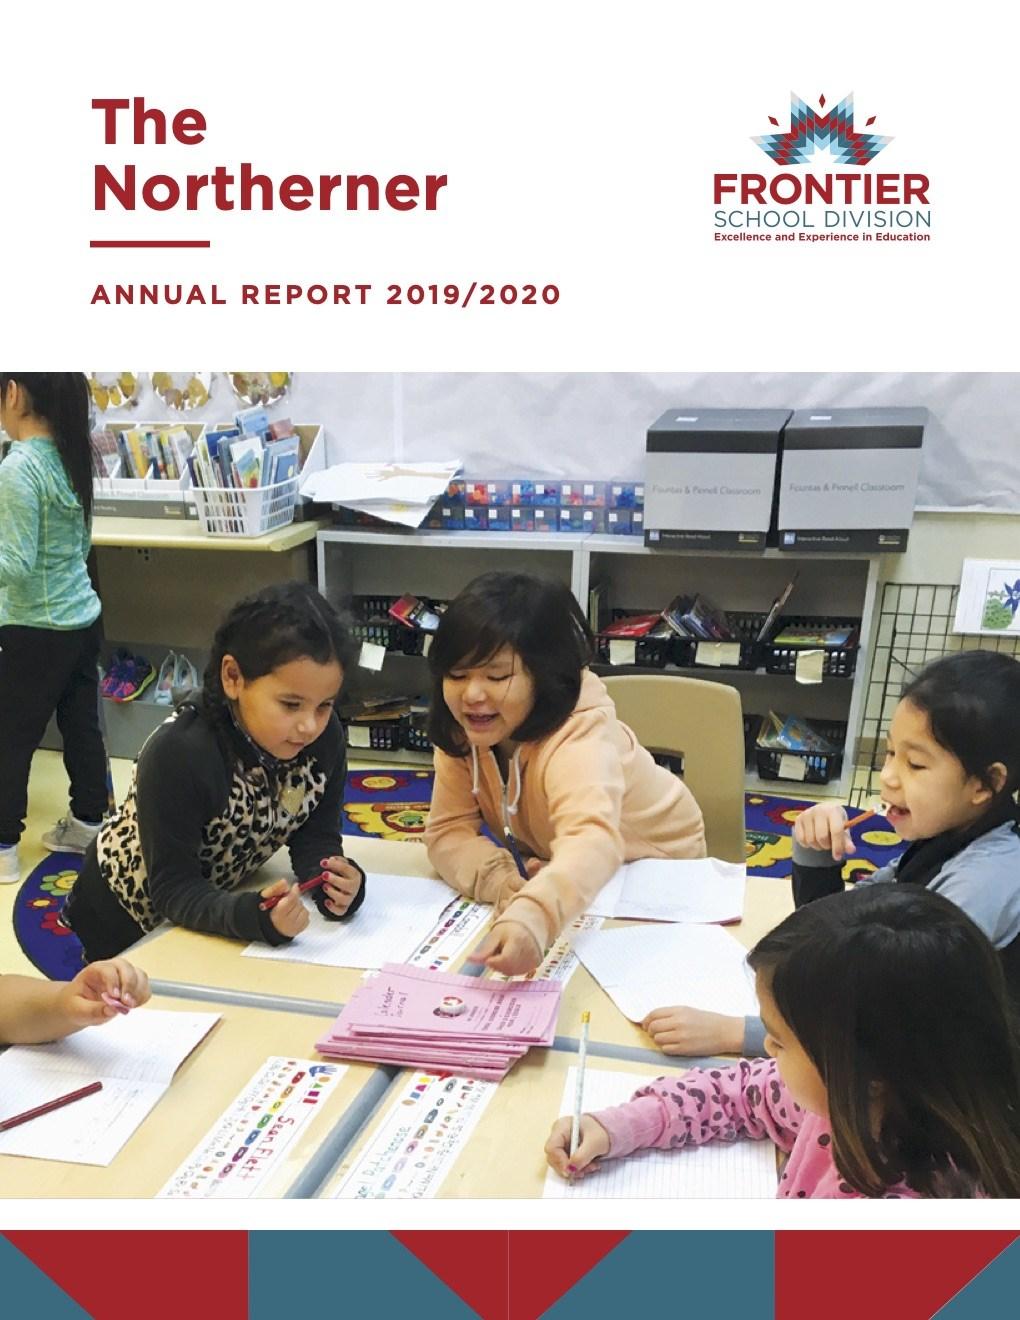 FSD 2019-20 Annual Report Cover.jpg